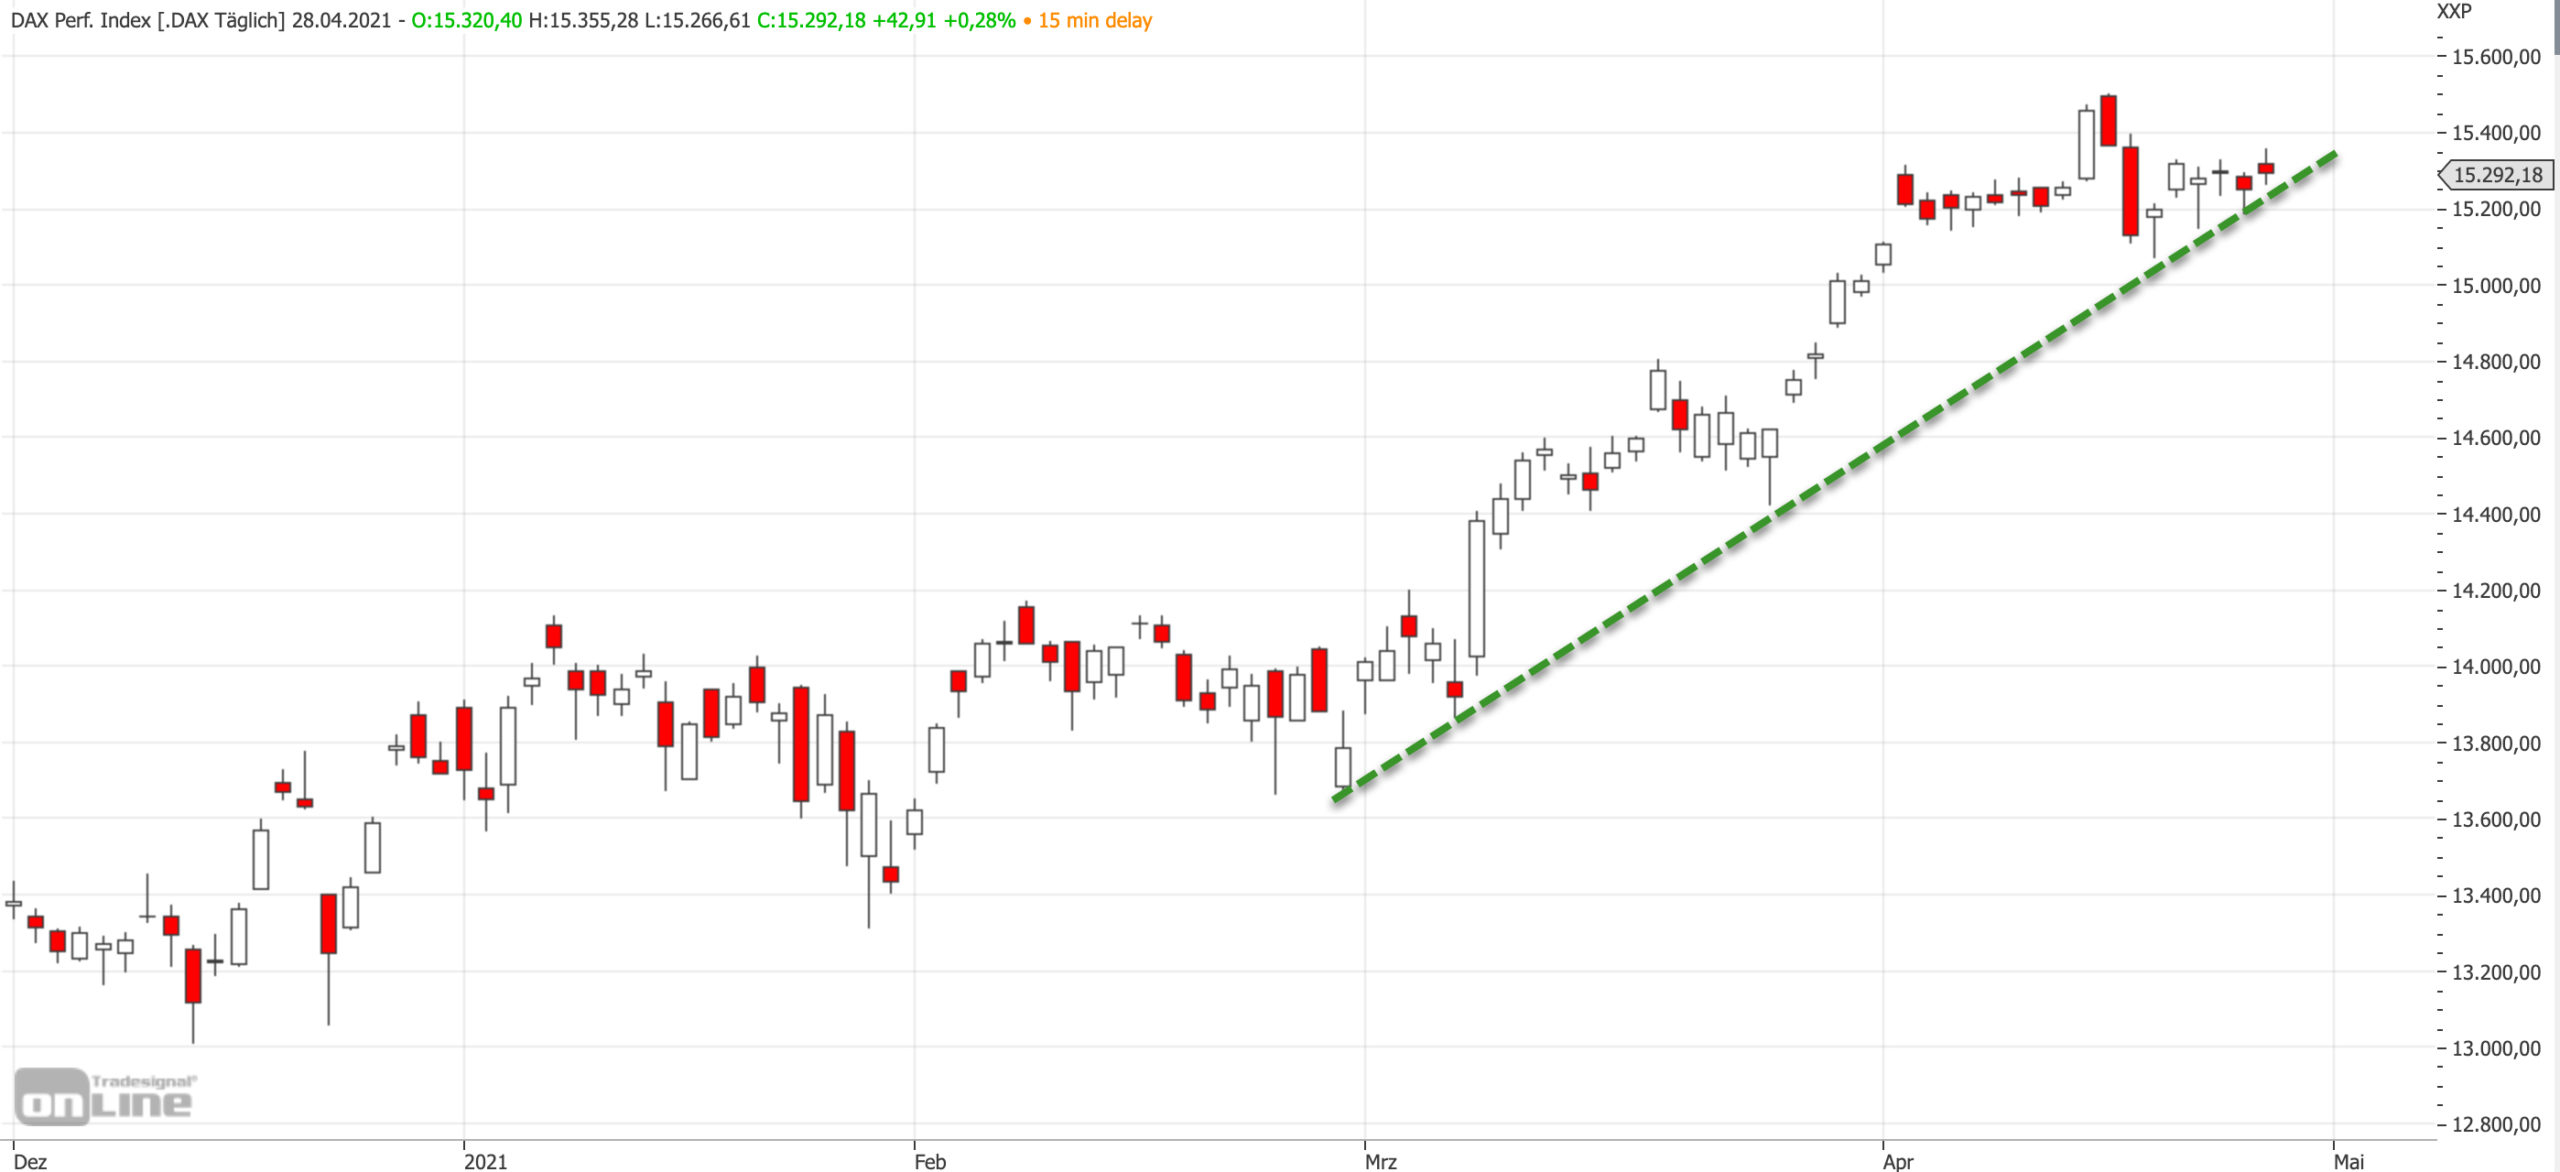 Mittelfristiger DAX-Chart am 28.04.2021